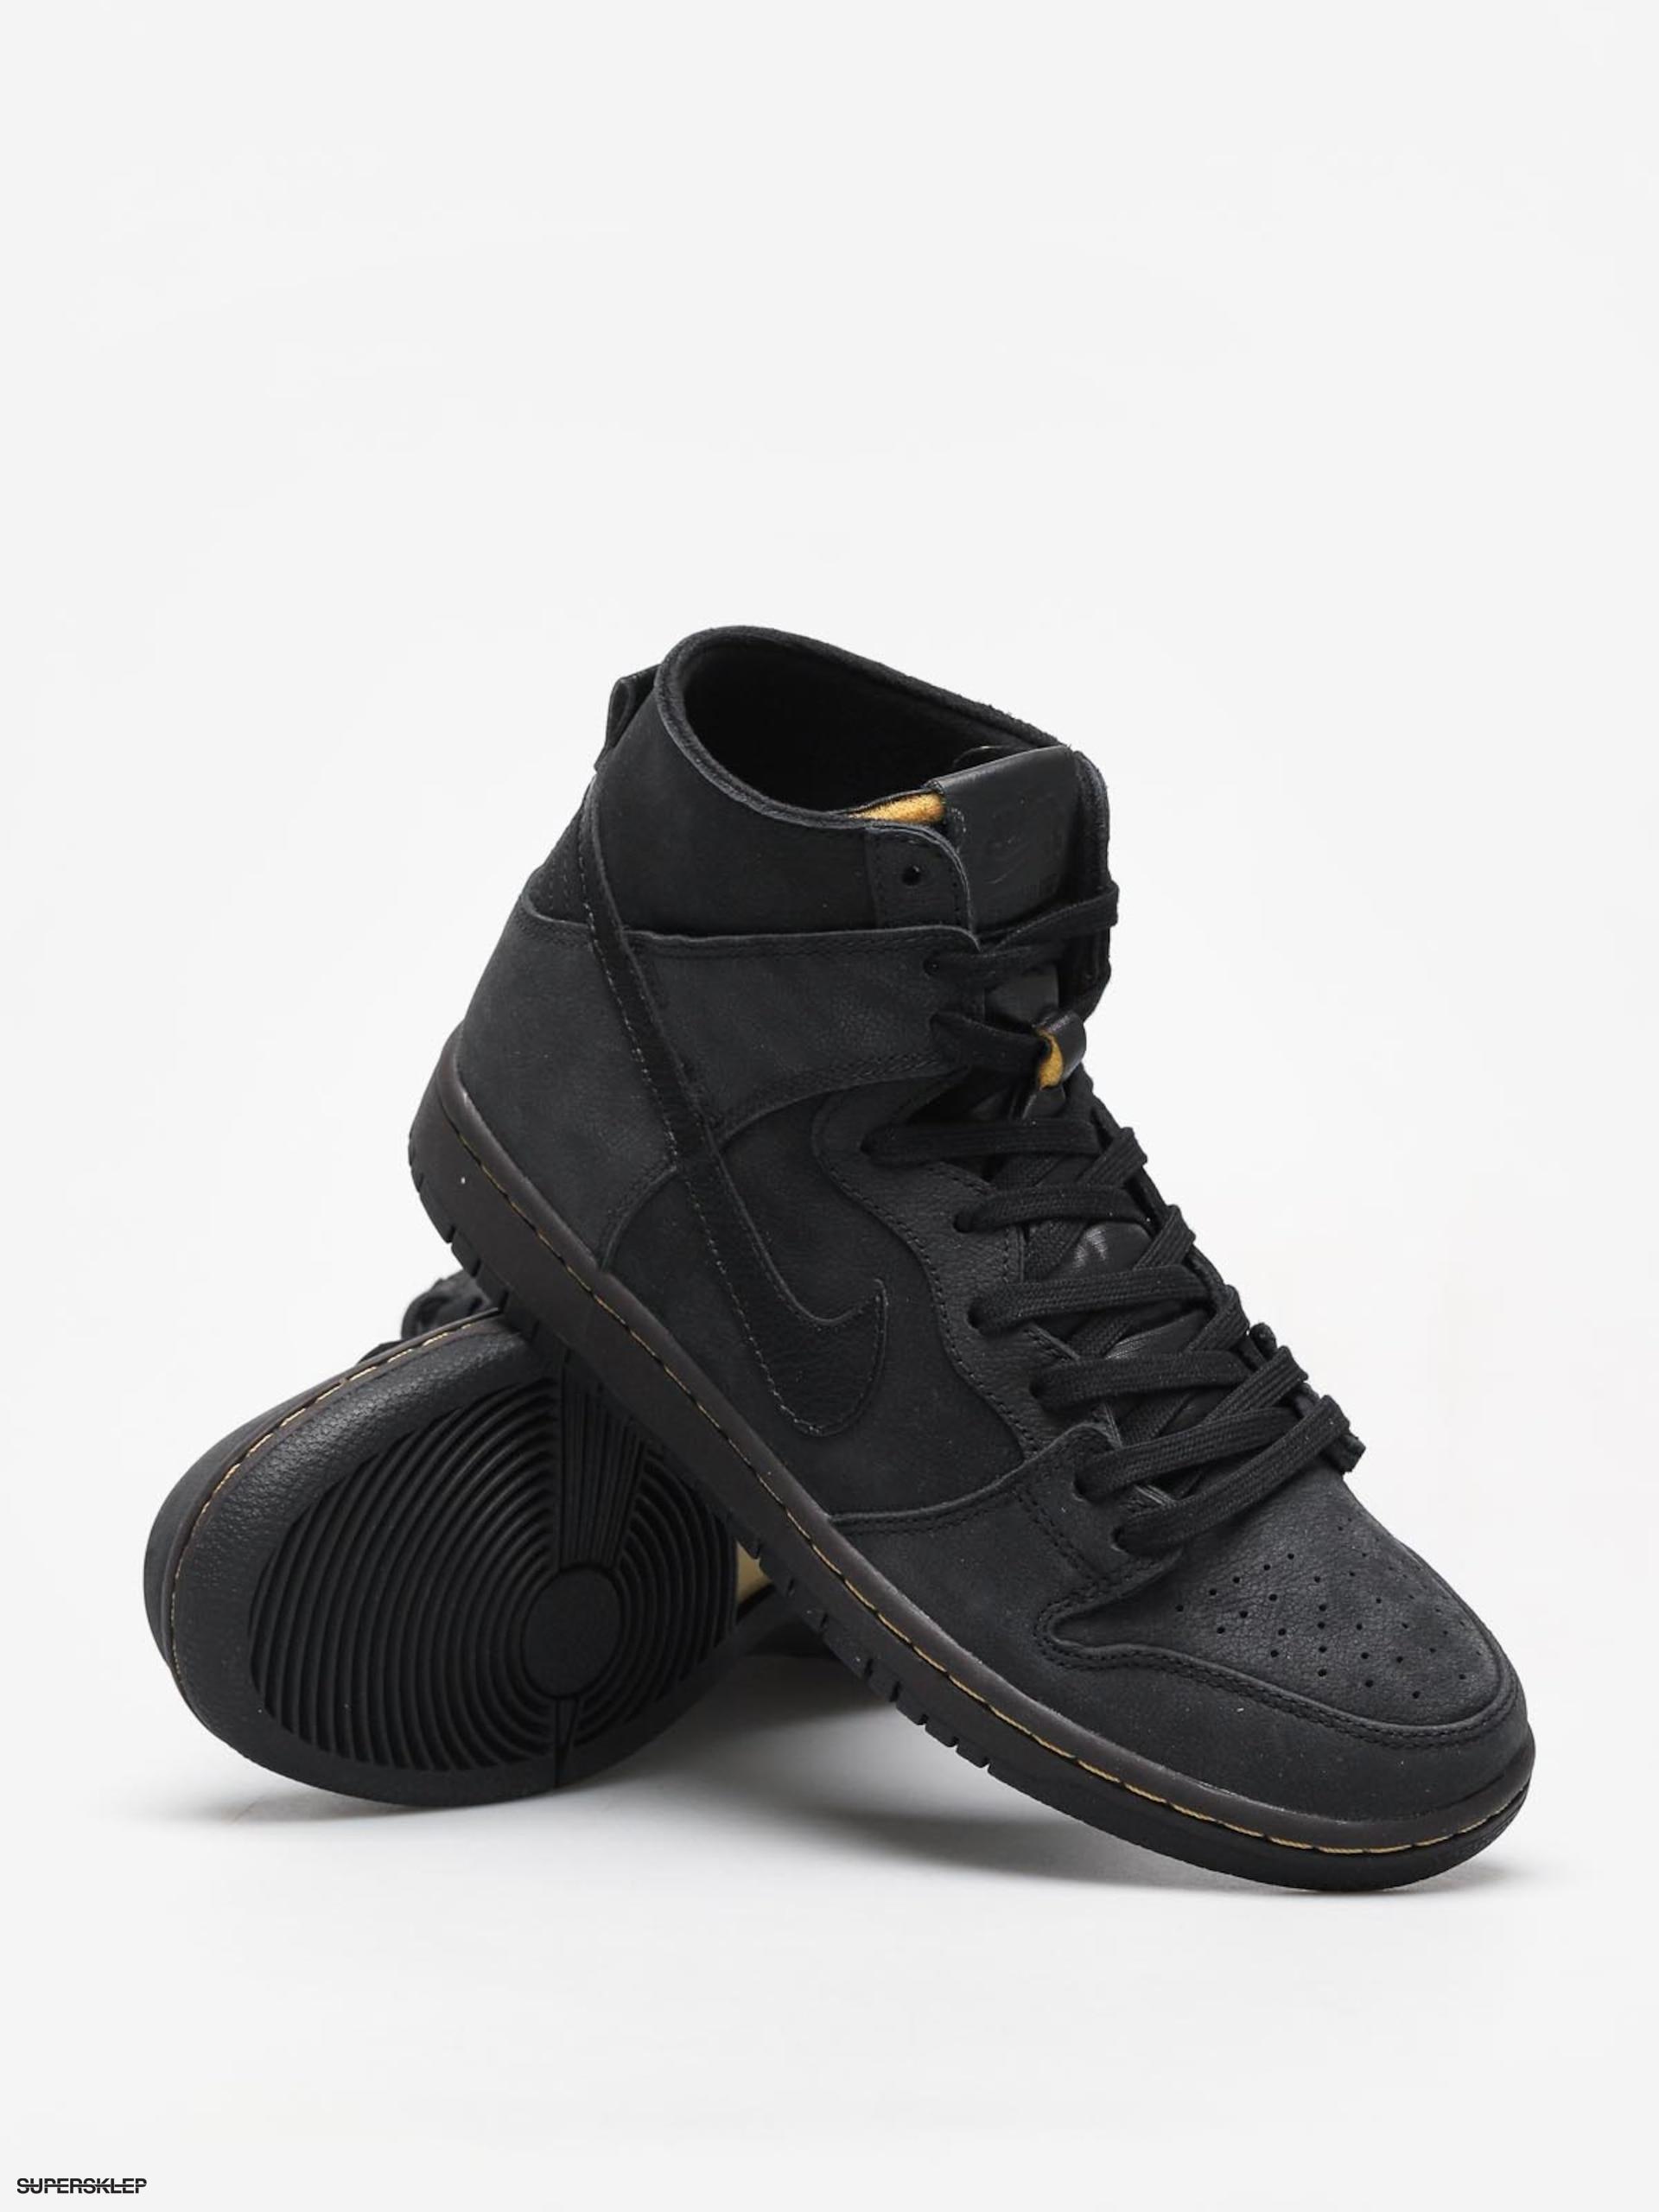 39ec6fbd22cd Buty Nike SB Sb Zoom Dunk High Pro Deconstructed Premium (black black  velvet brown peat moss)